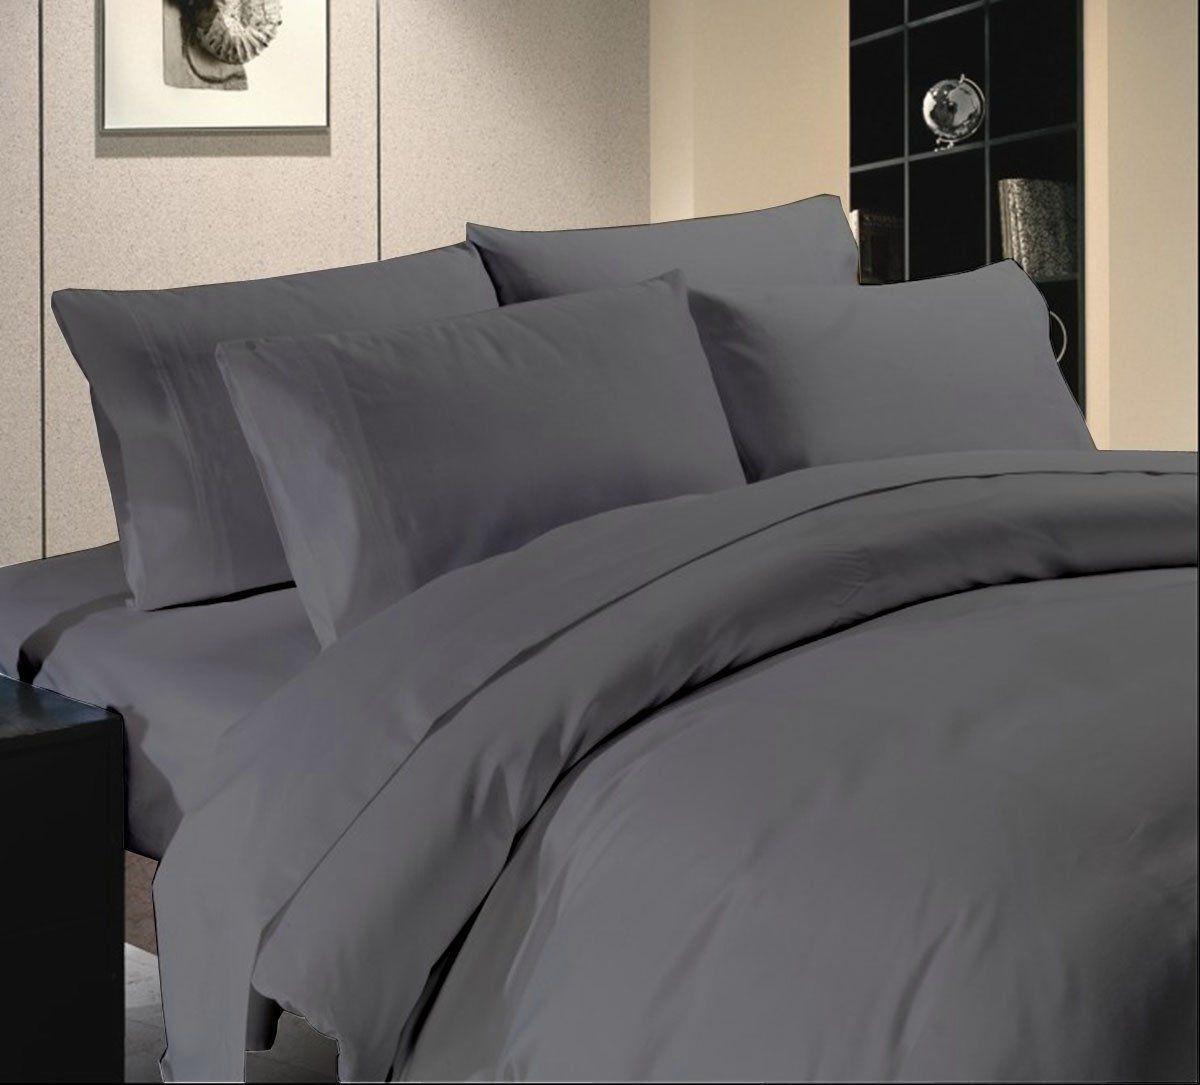 Hotel Quality Flat Sheet Set 3 pc 1000TC 100/%Egyptian cotton Select Size/&Color